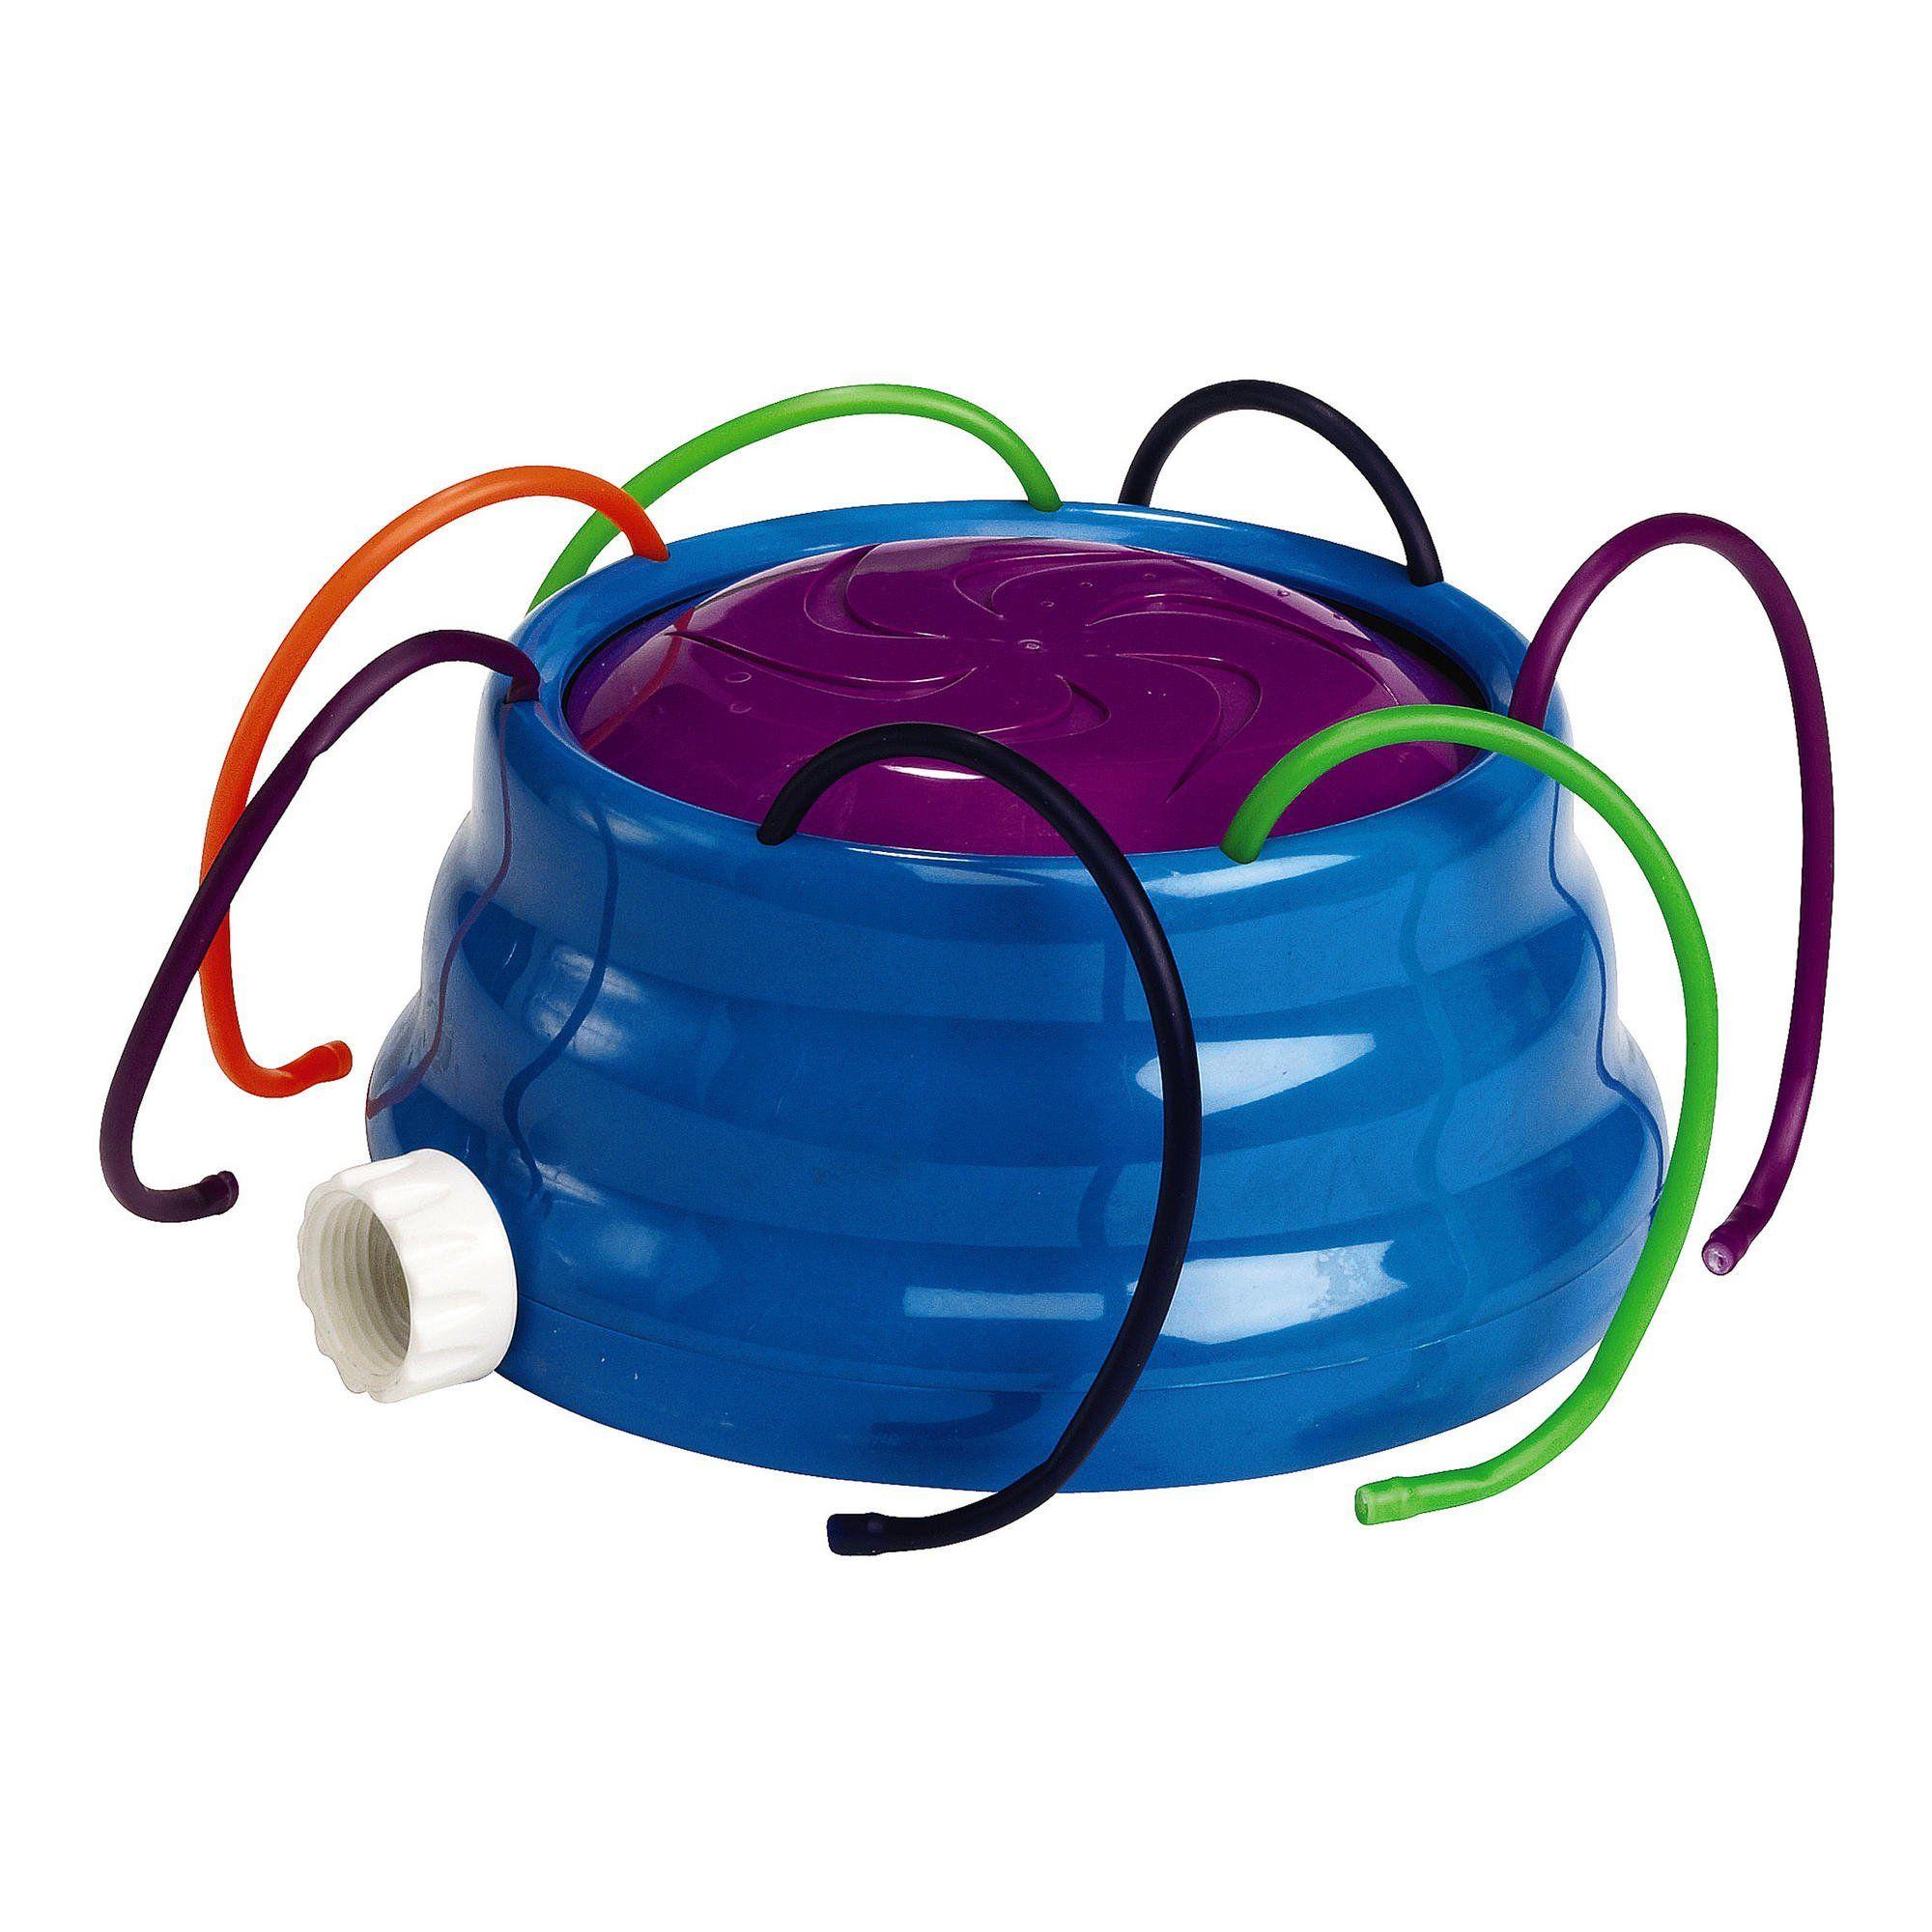 Discovery kids outdoor wiggling vortex